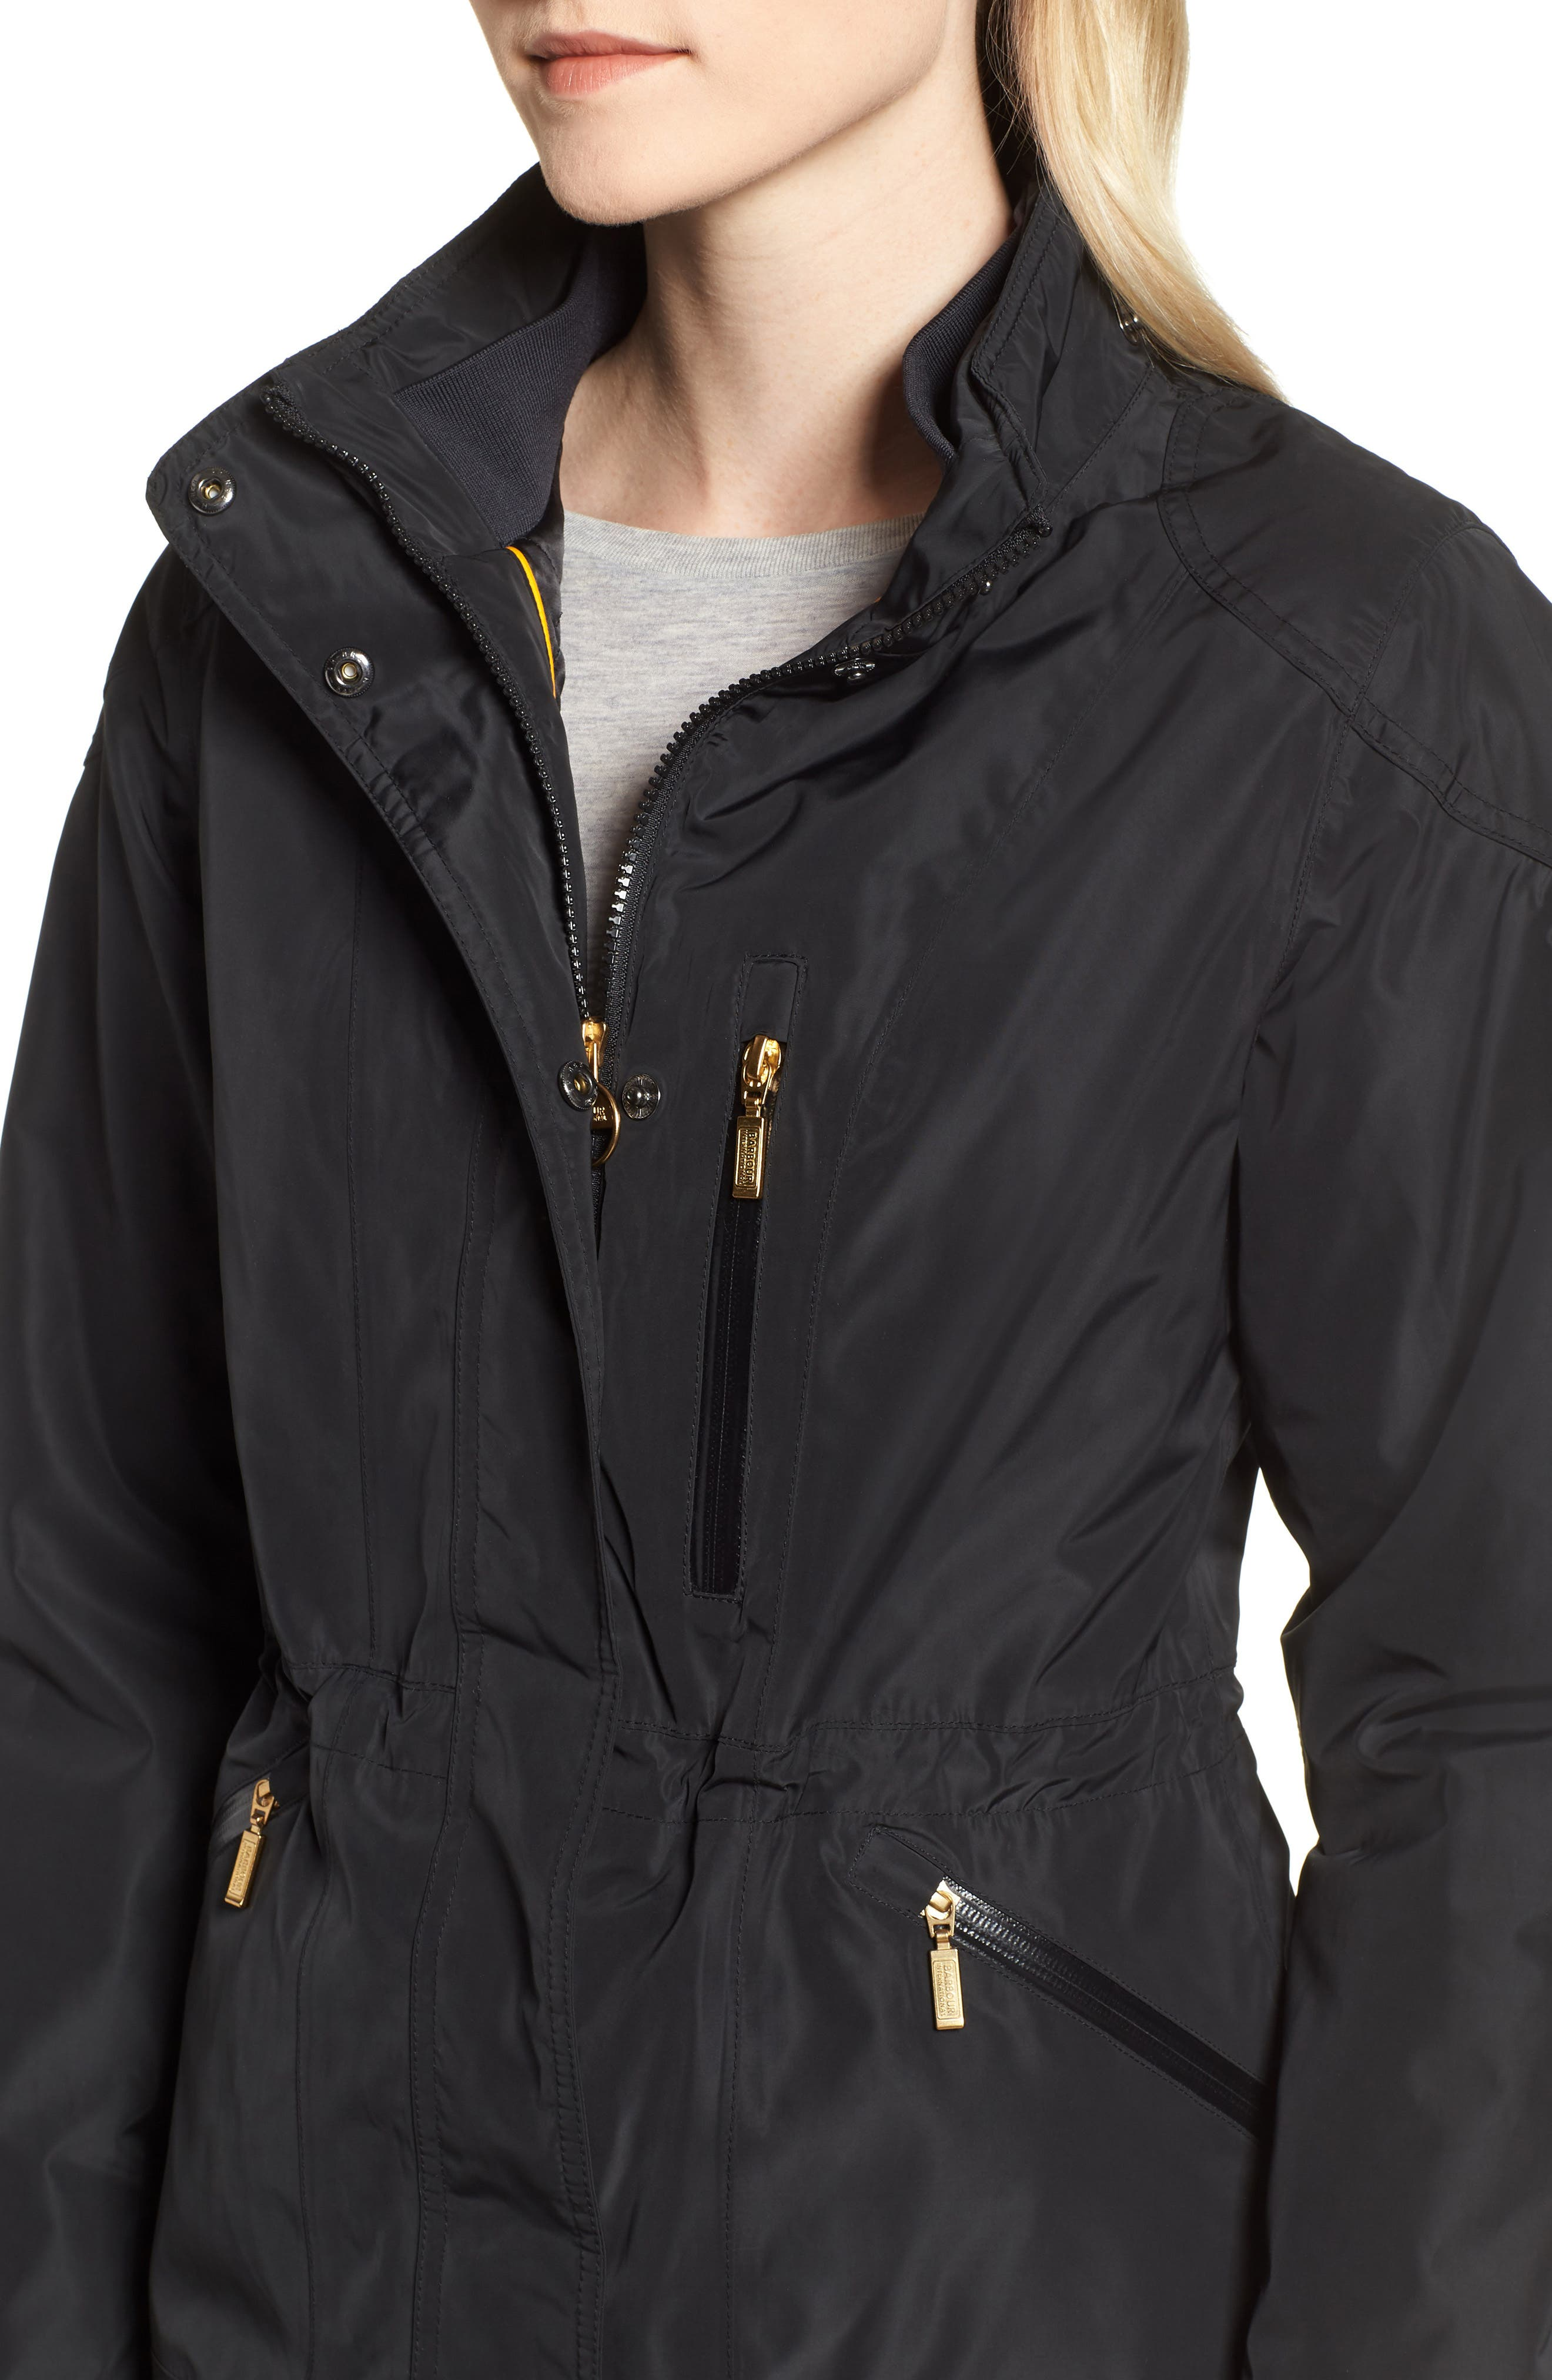 BARBOUR,                             International Aragon Waterproof Breathable Faux Fur Trim Jacket,                             Alternate thumbnail 5, color,                             001